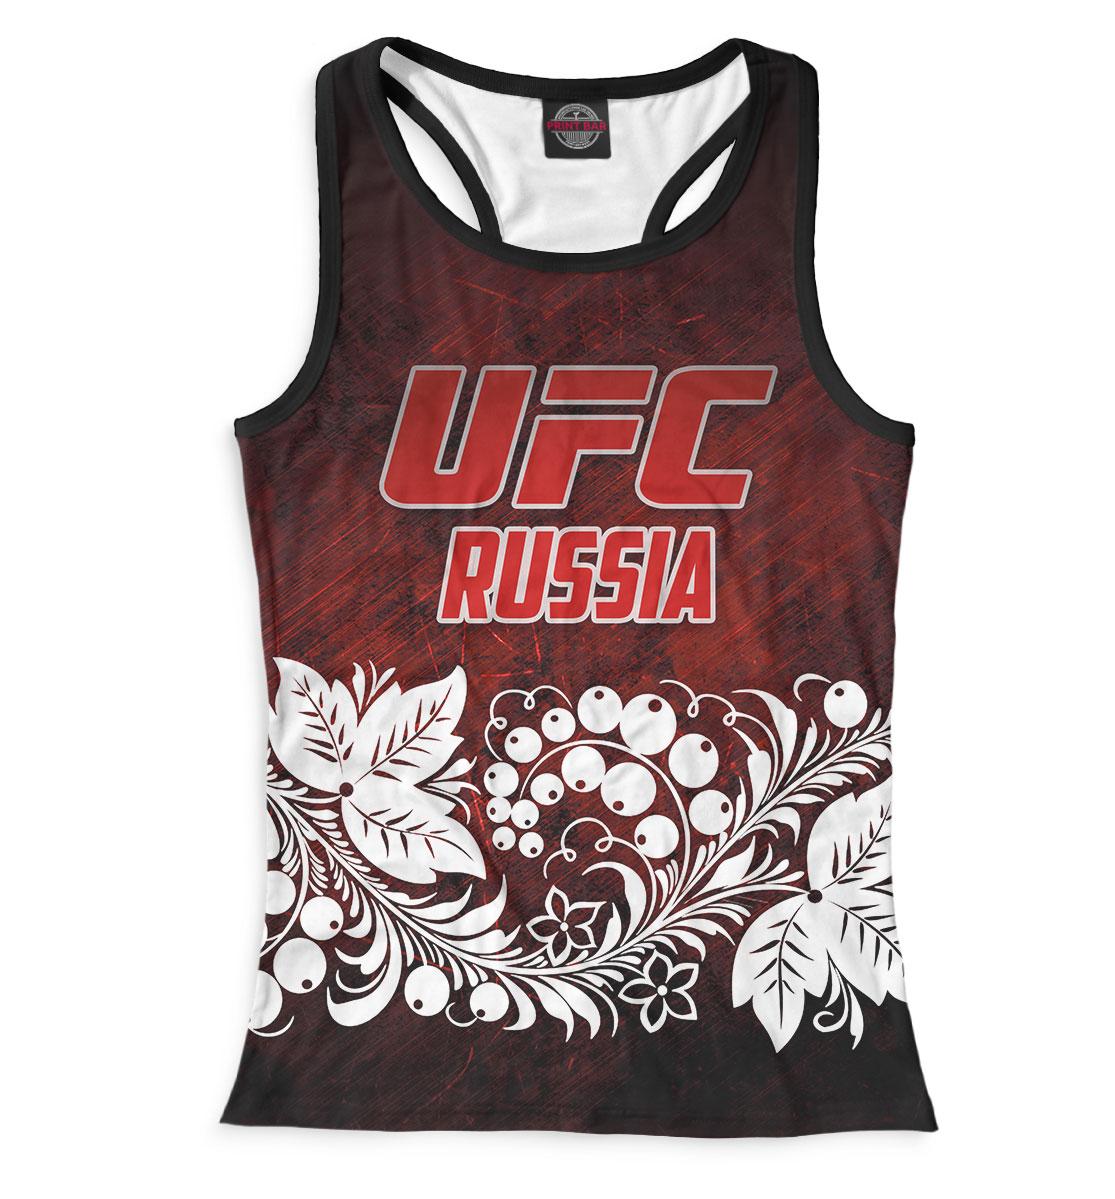 Купить UFC Russia, Printbar, Майки борцовки, MNU-613848-mayb-1